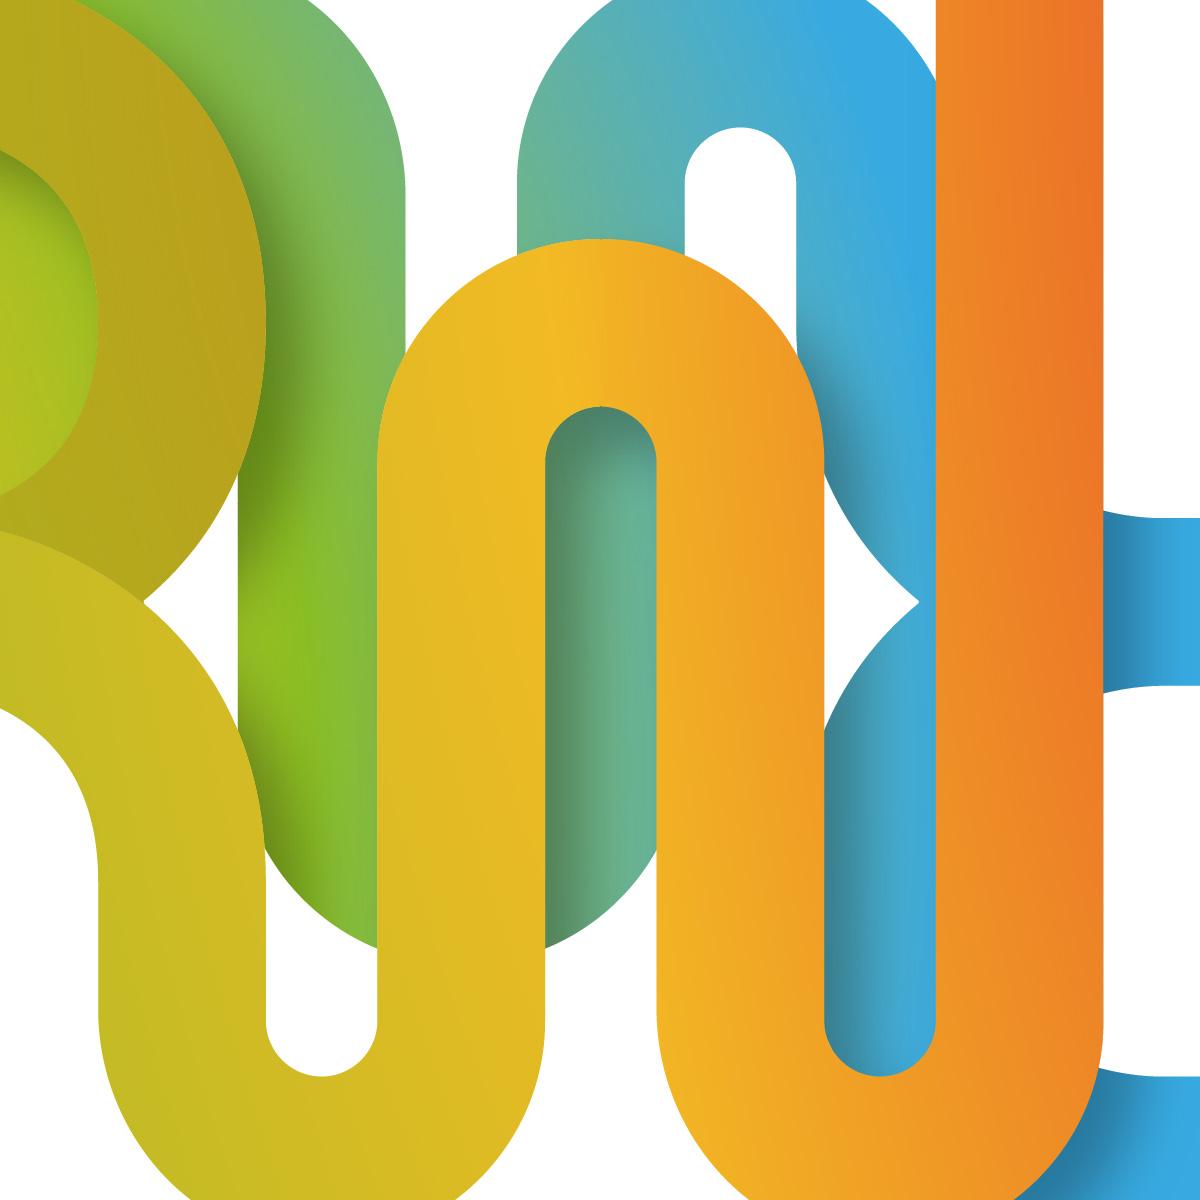 romagna_welcome-rimini_influencer_marketing_turismo_2019-evidenza